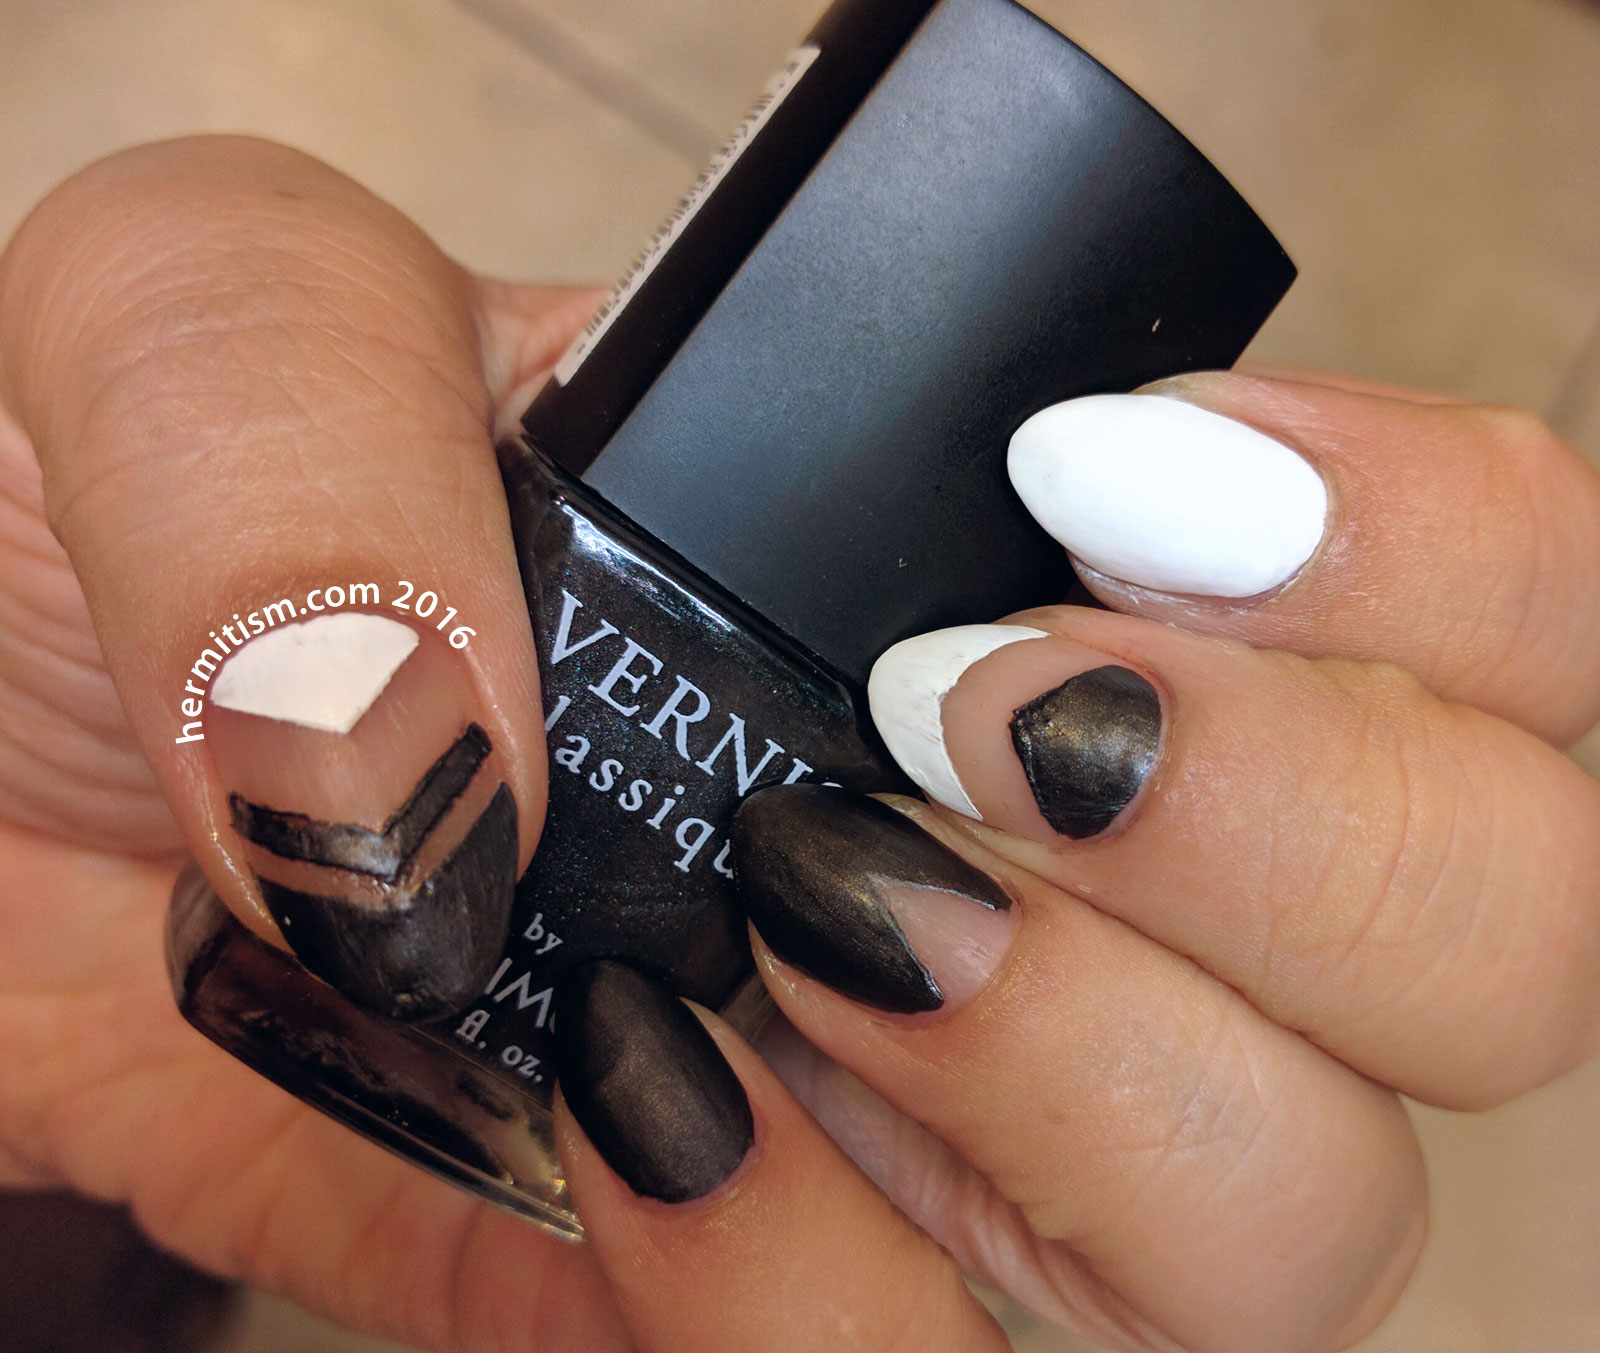 Black and White - 31 Day Challenge Nail Art - Hermit Werds